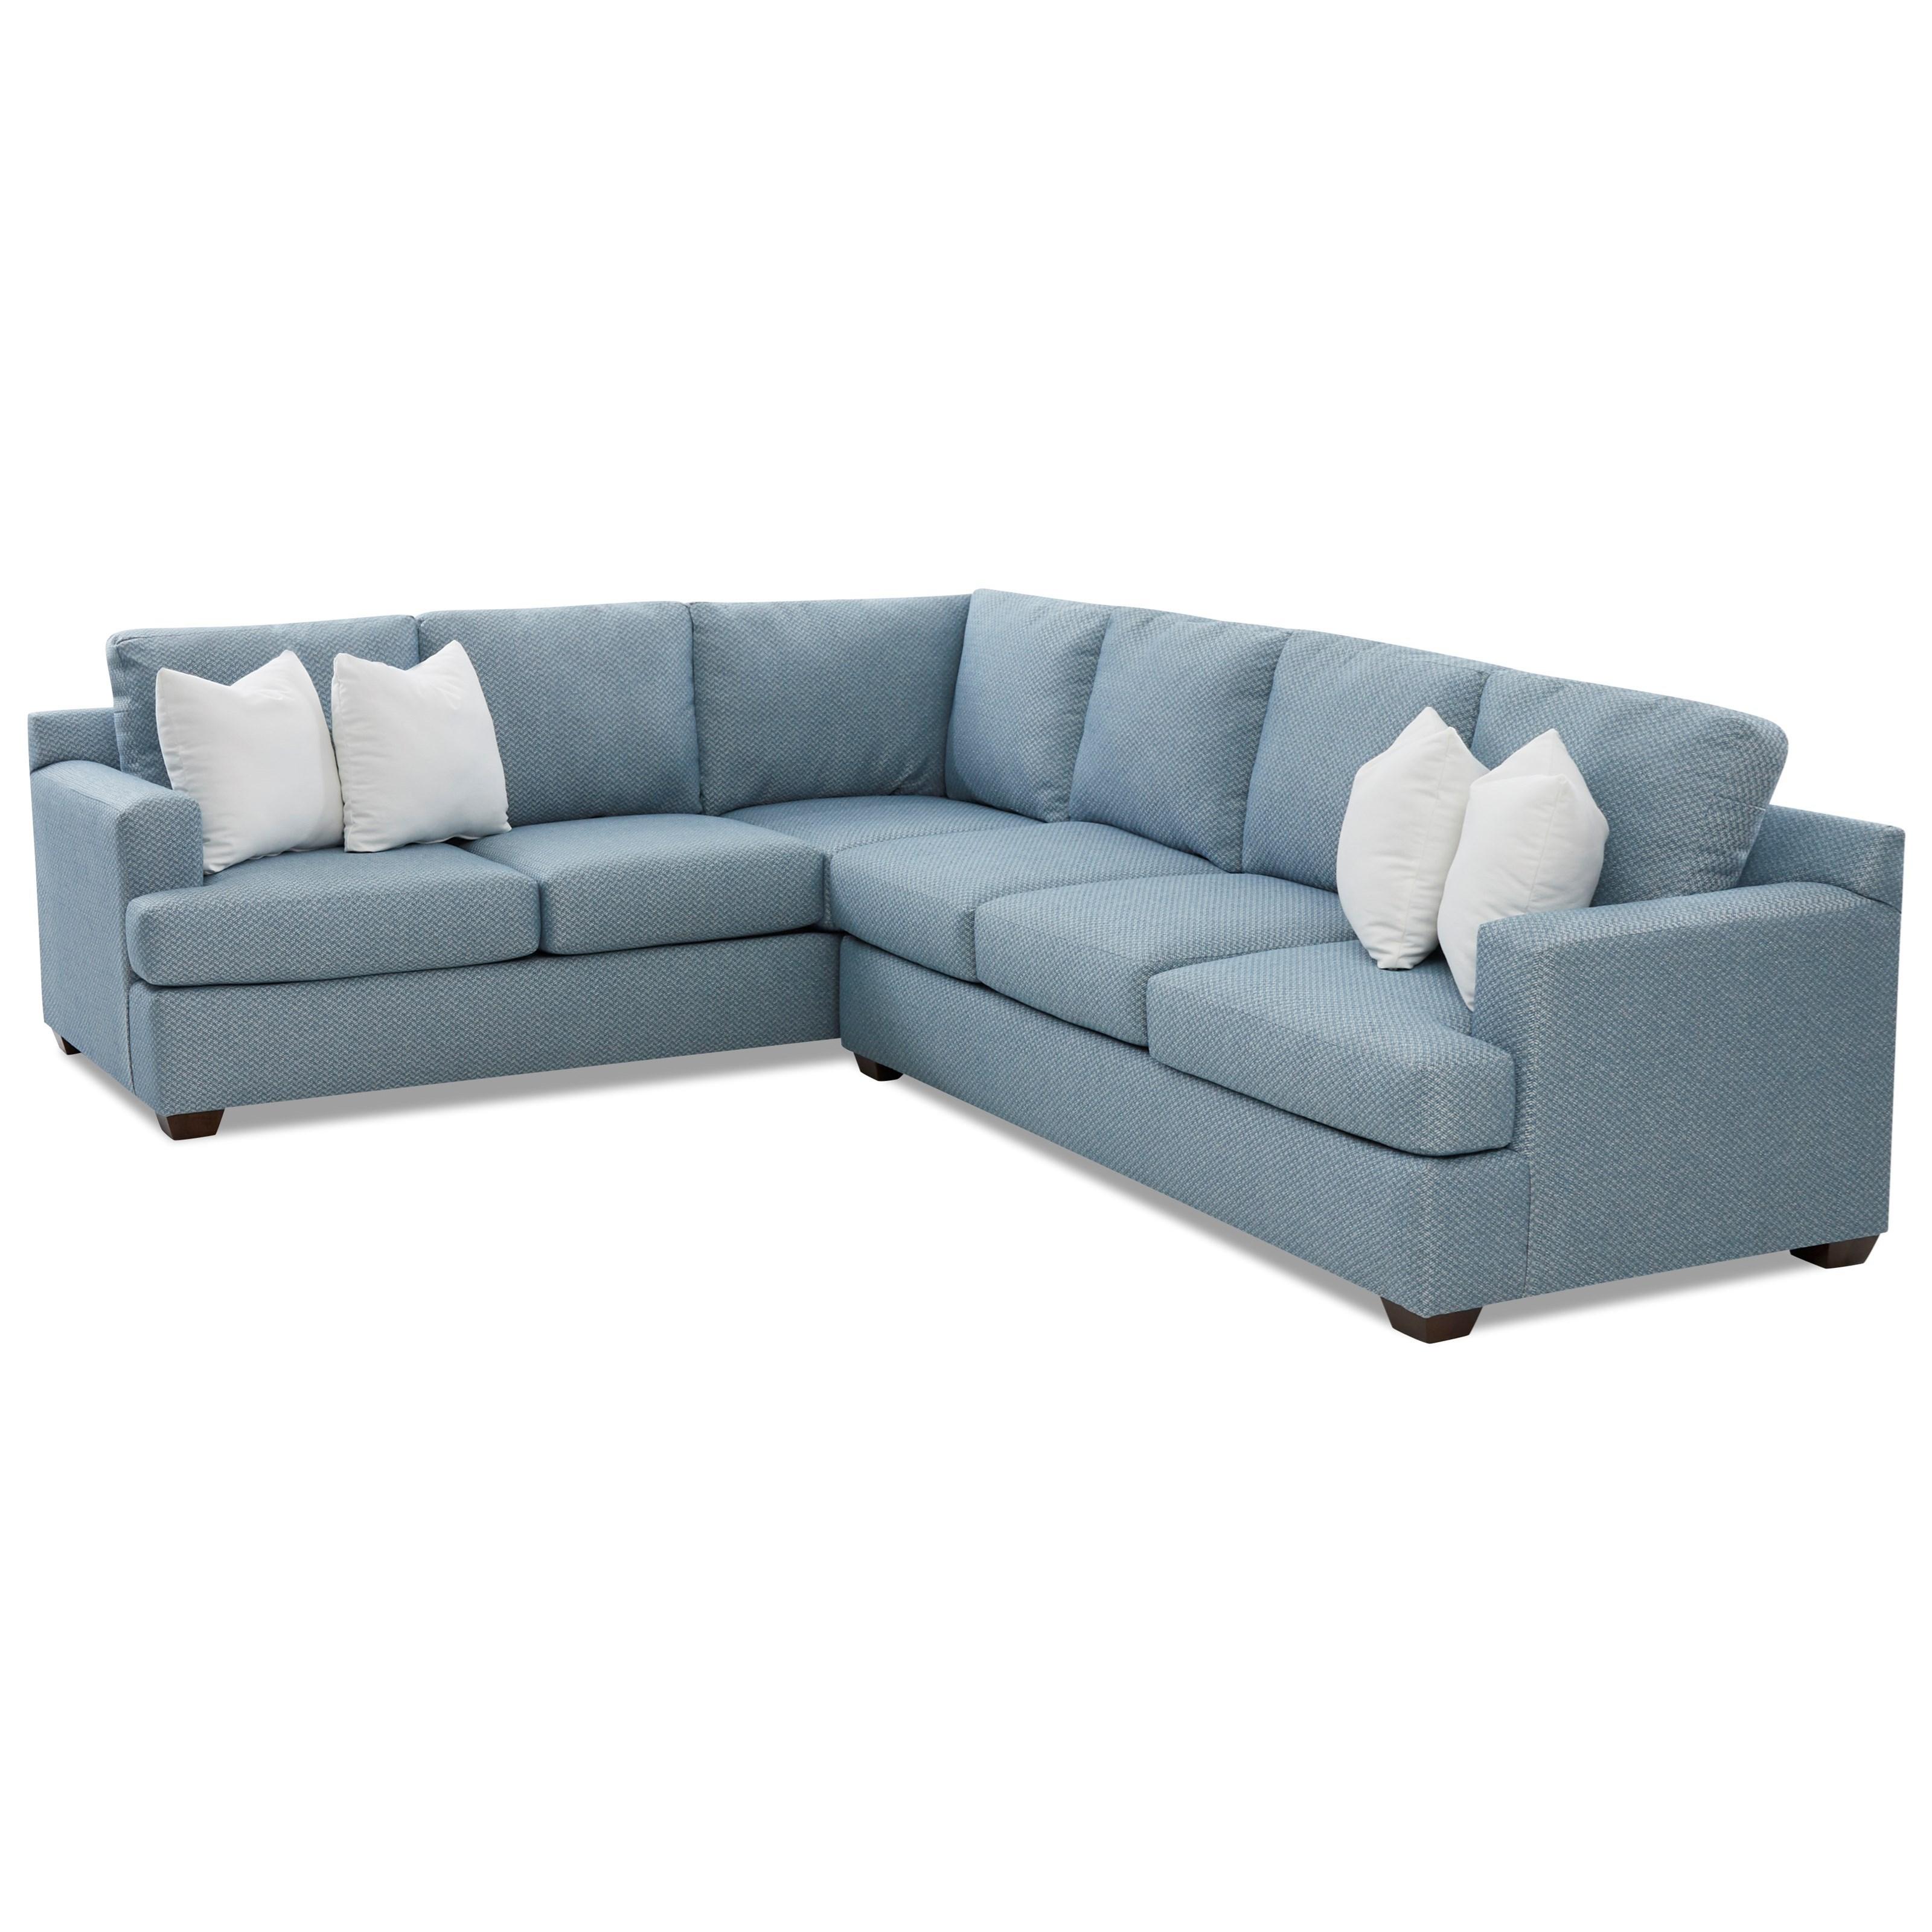 juniper 5 seat sectional sofa with laf corner